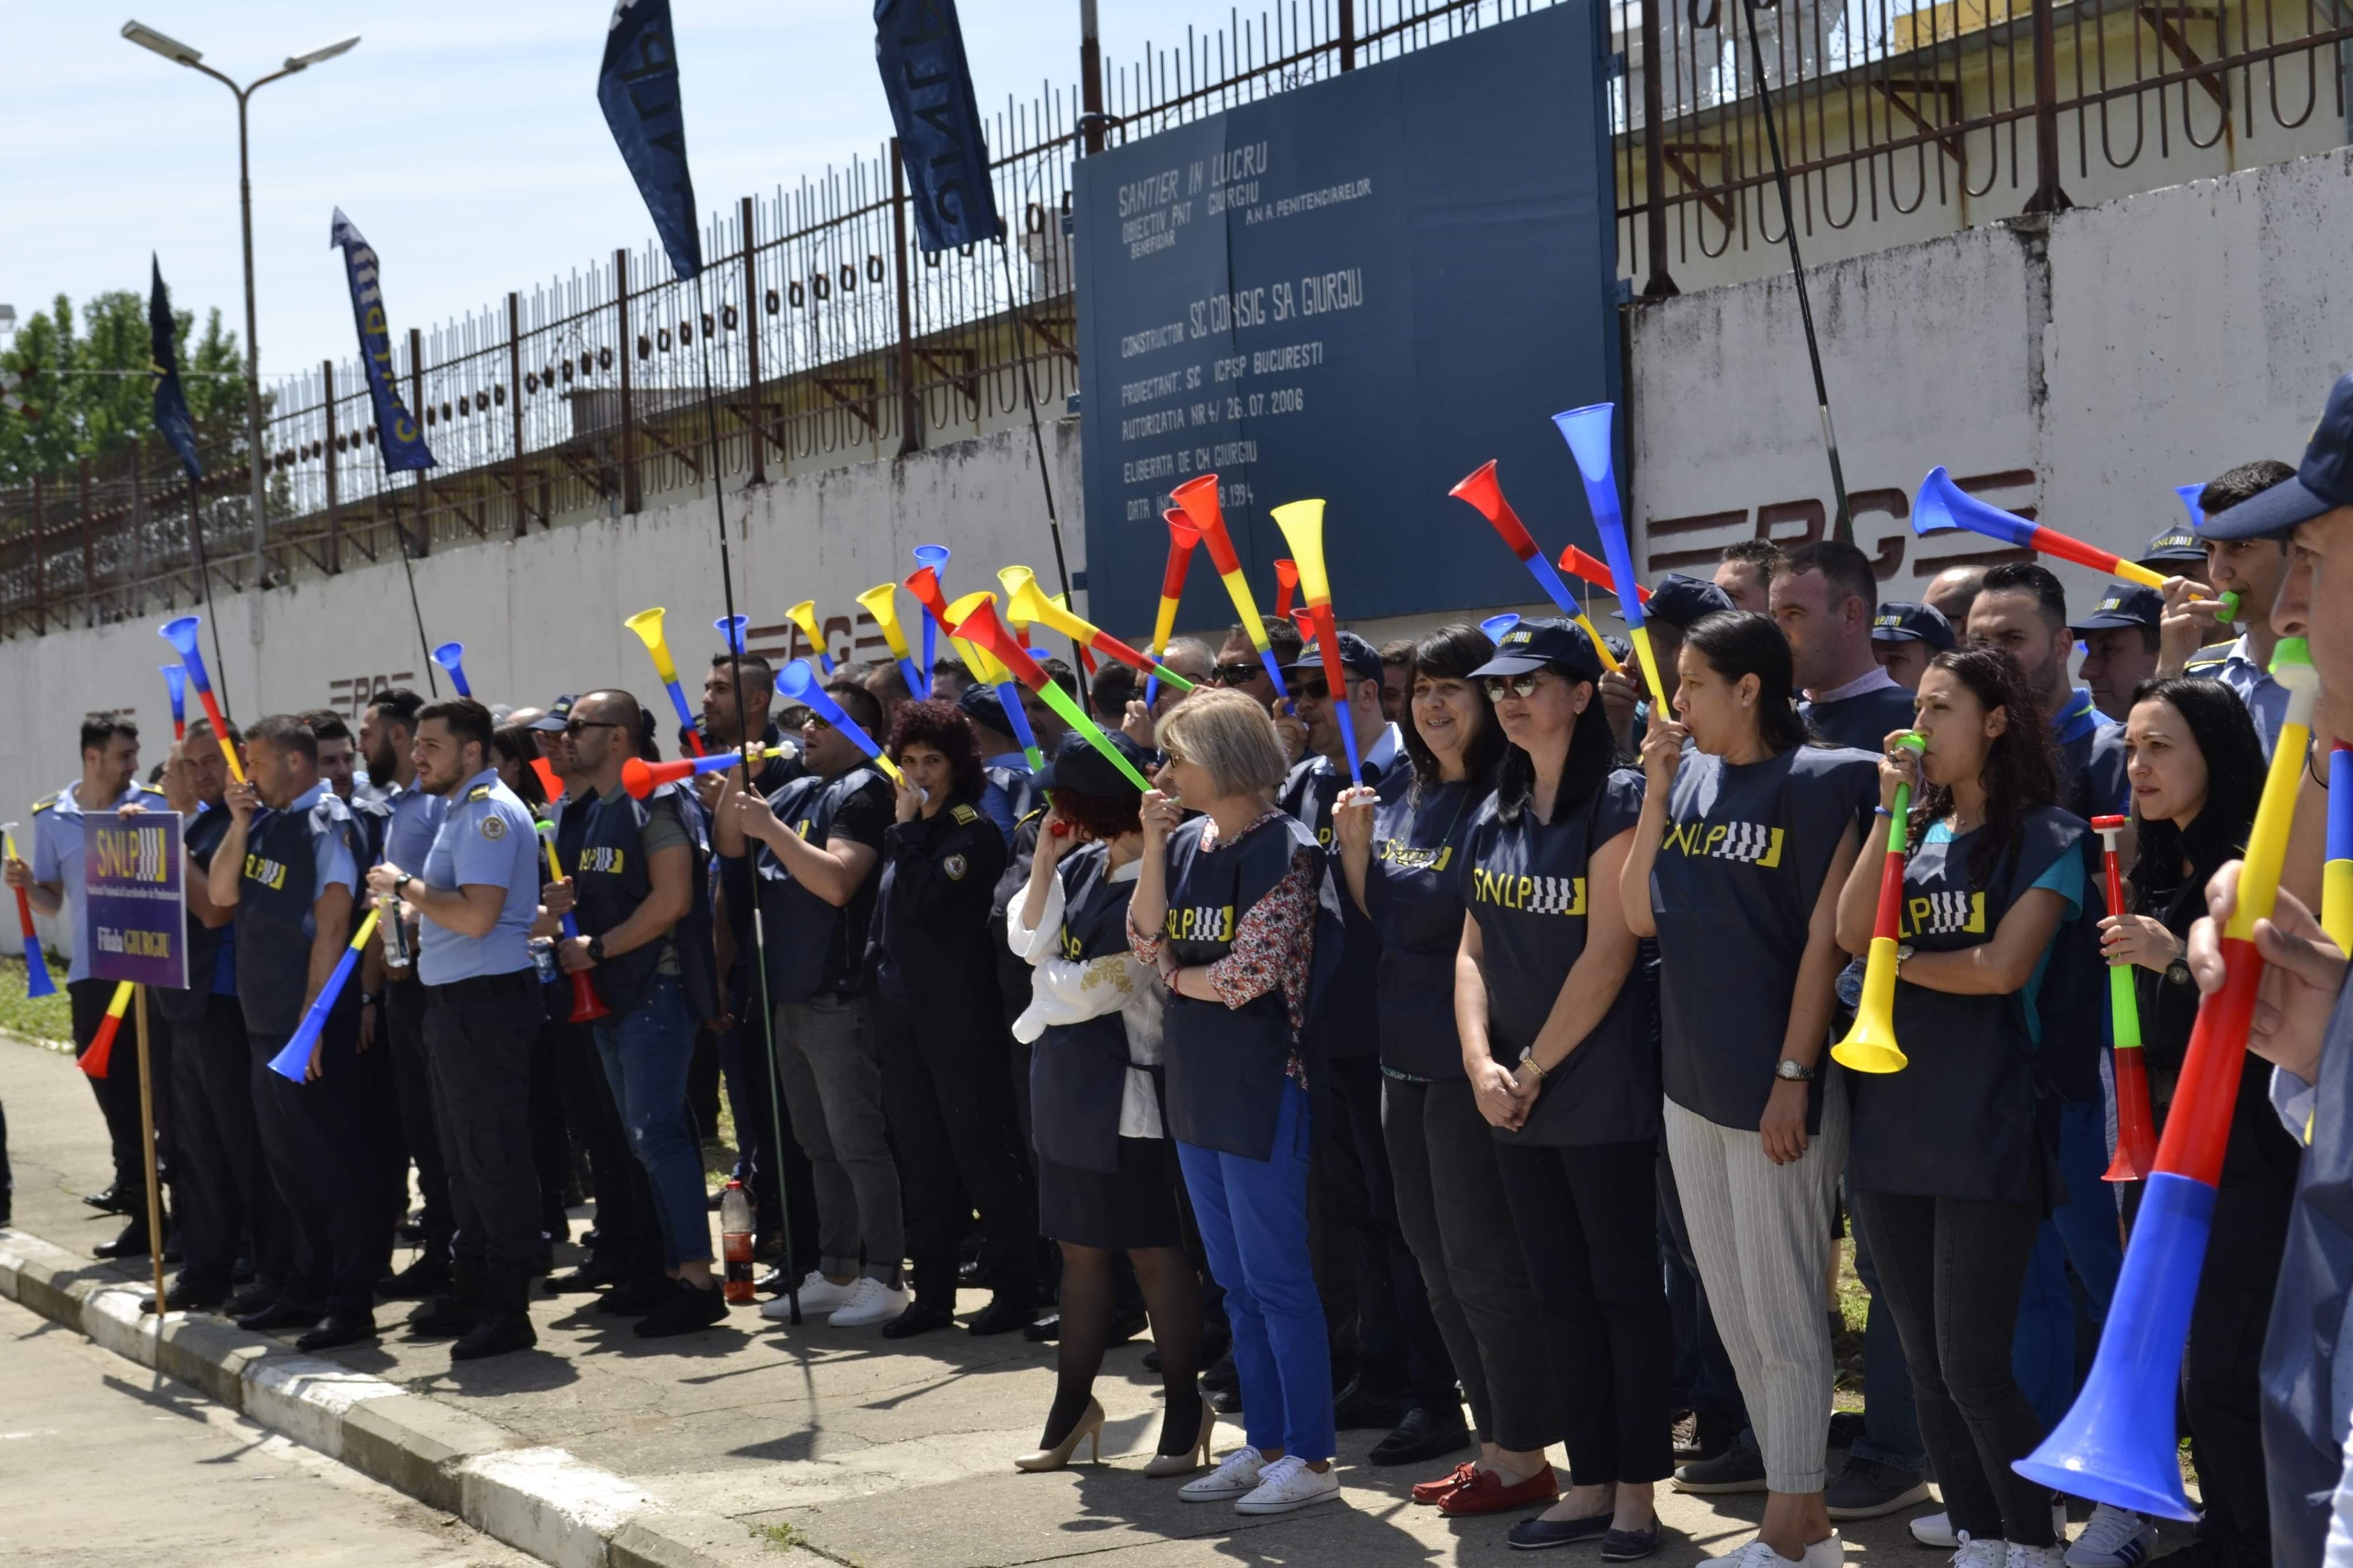 Stopam munca fortata! Au protestat azi: 130 – SNLP Gherla si 160 – SNLP Giurgiu